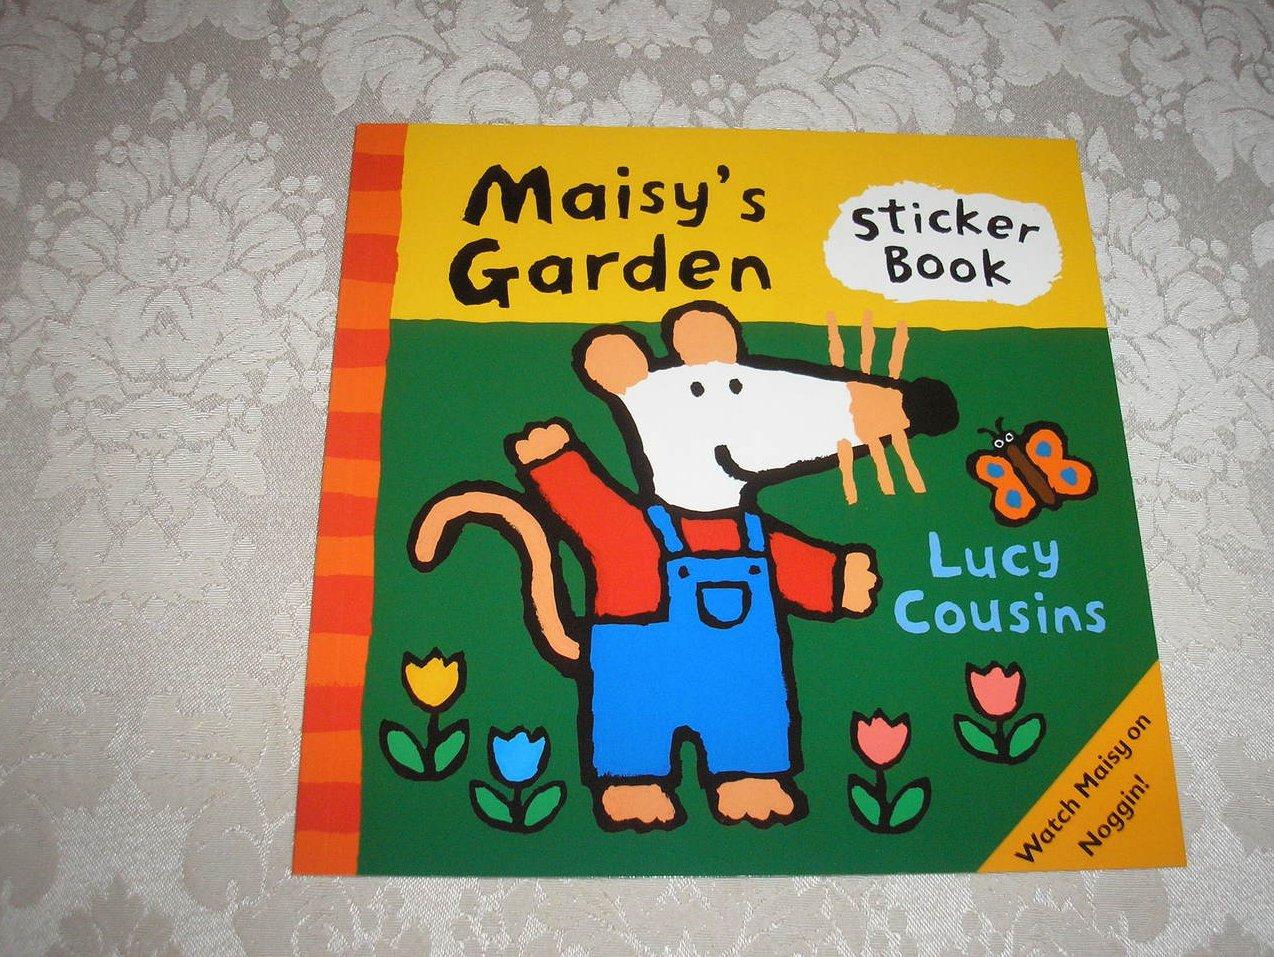 Maisy's Garden Sticker Book Lucy Cousins brand new